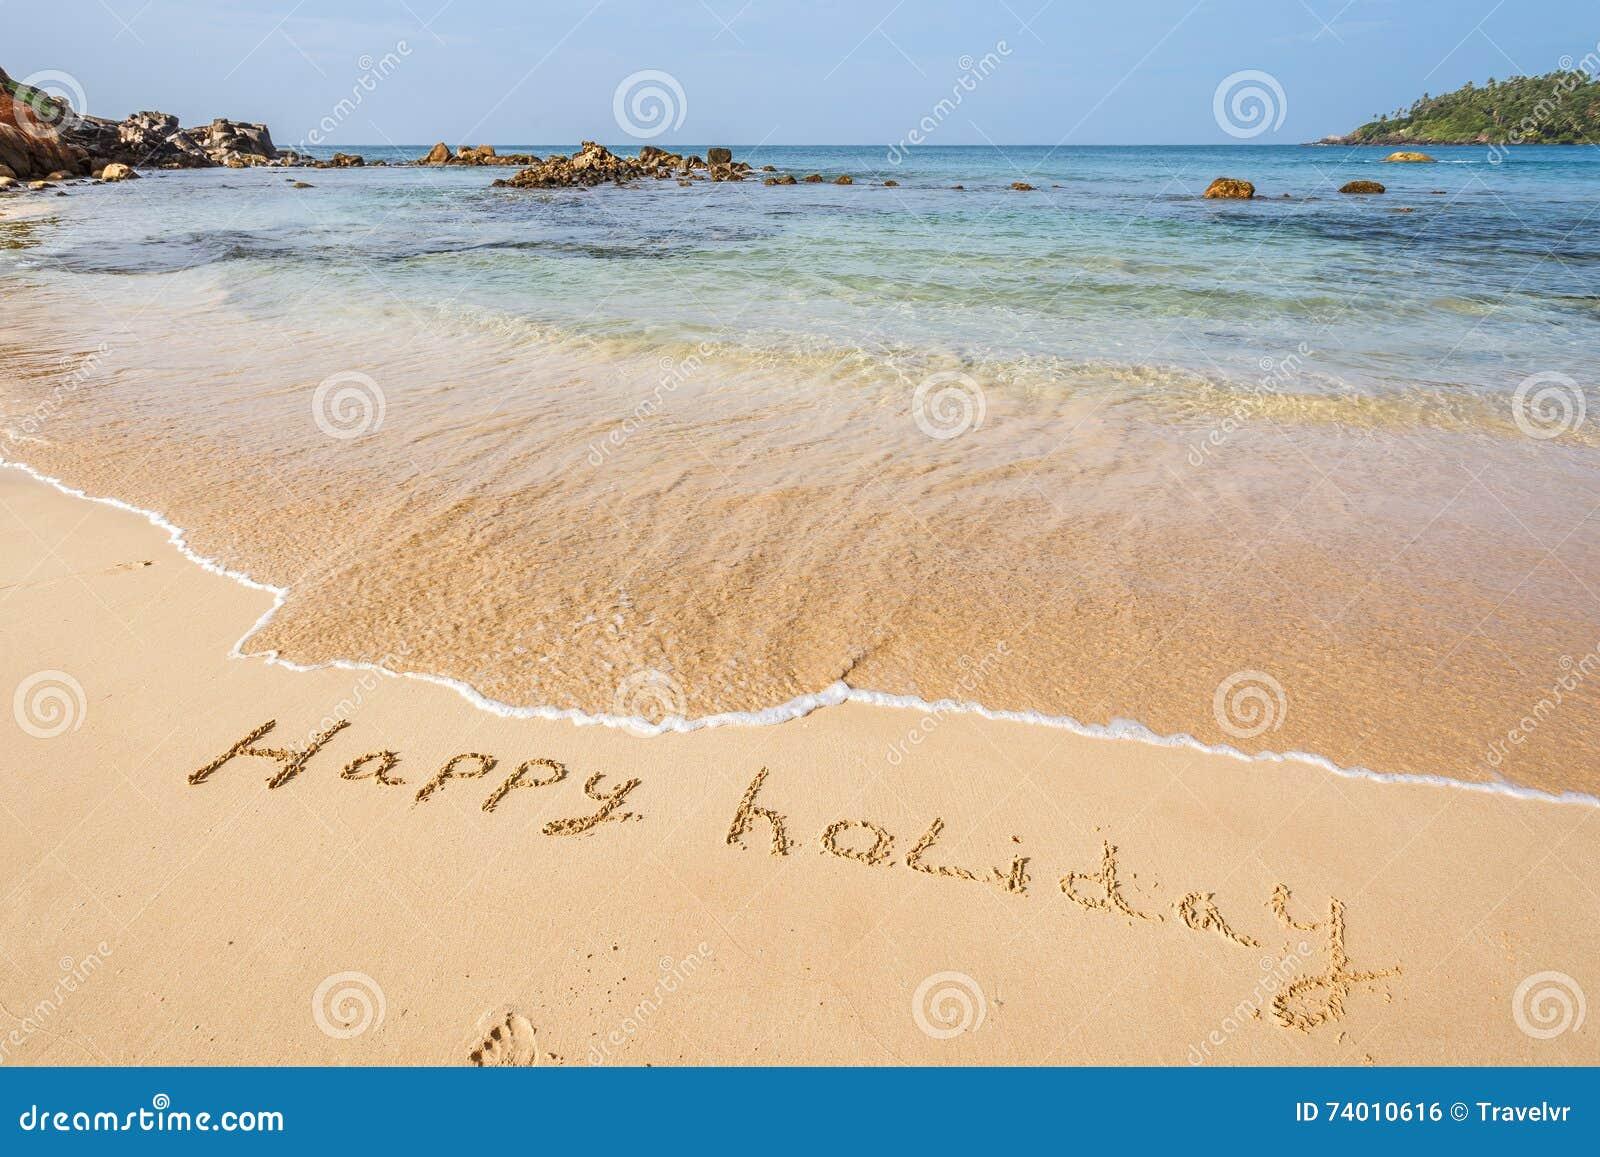 Happy Holidays On The Beach